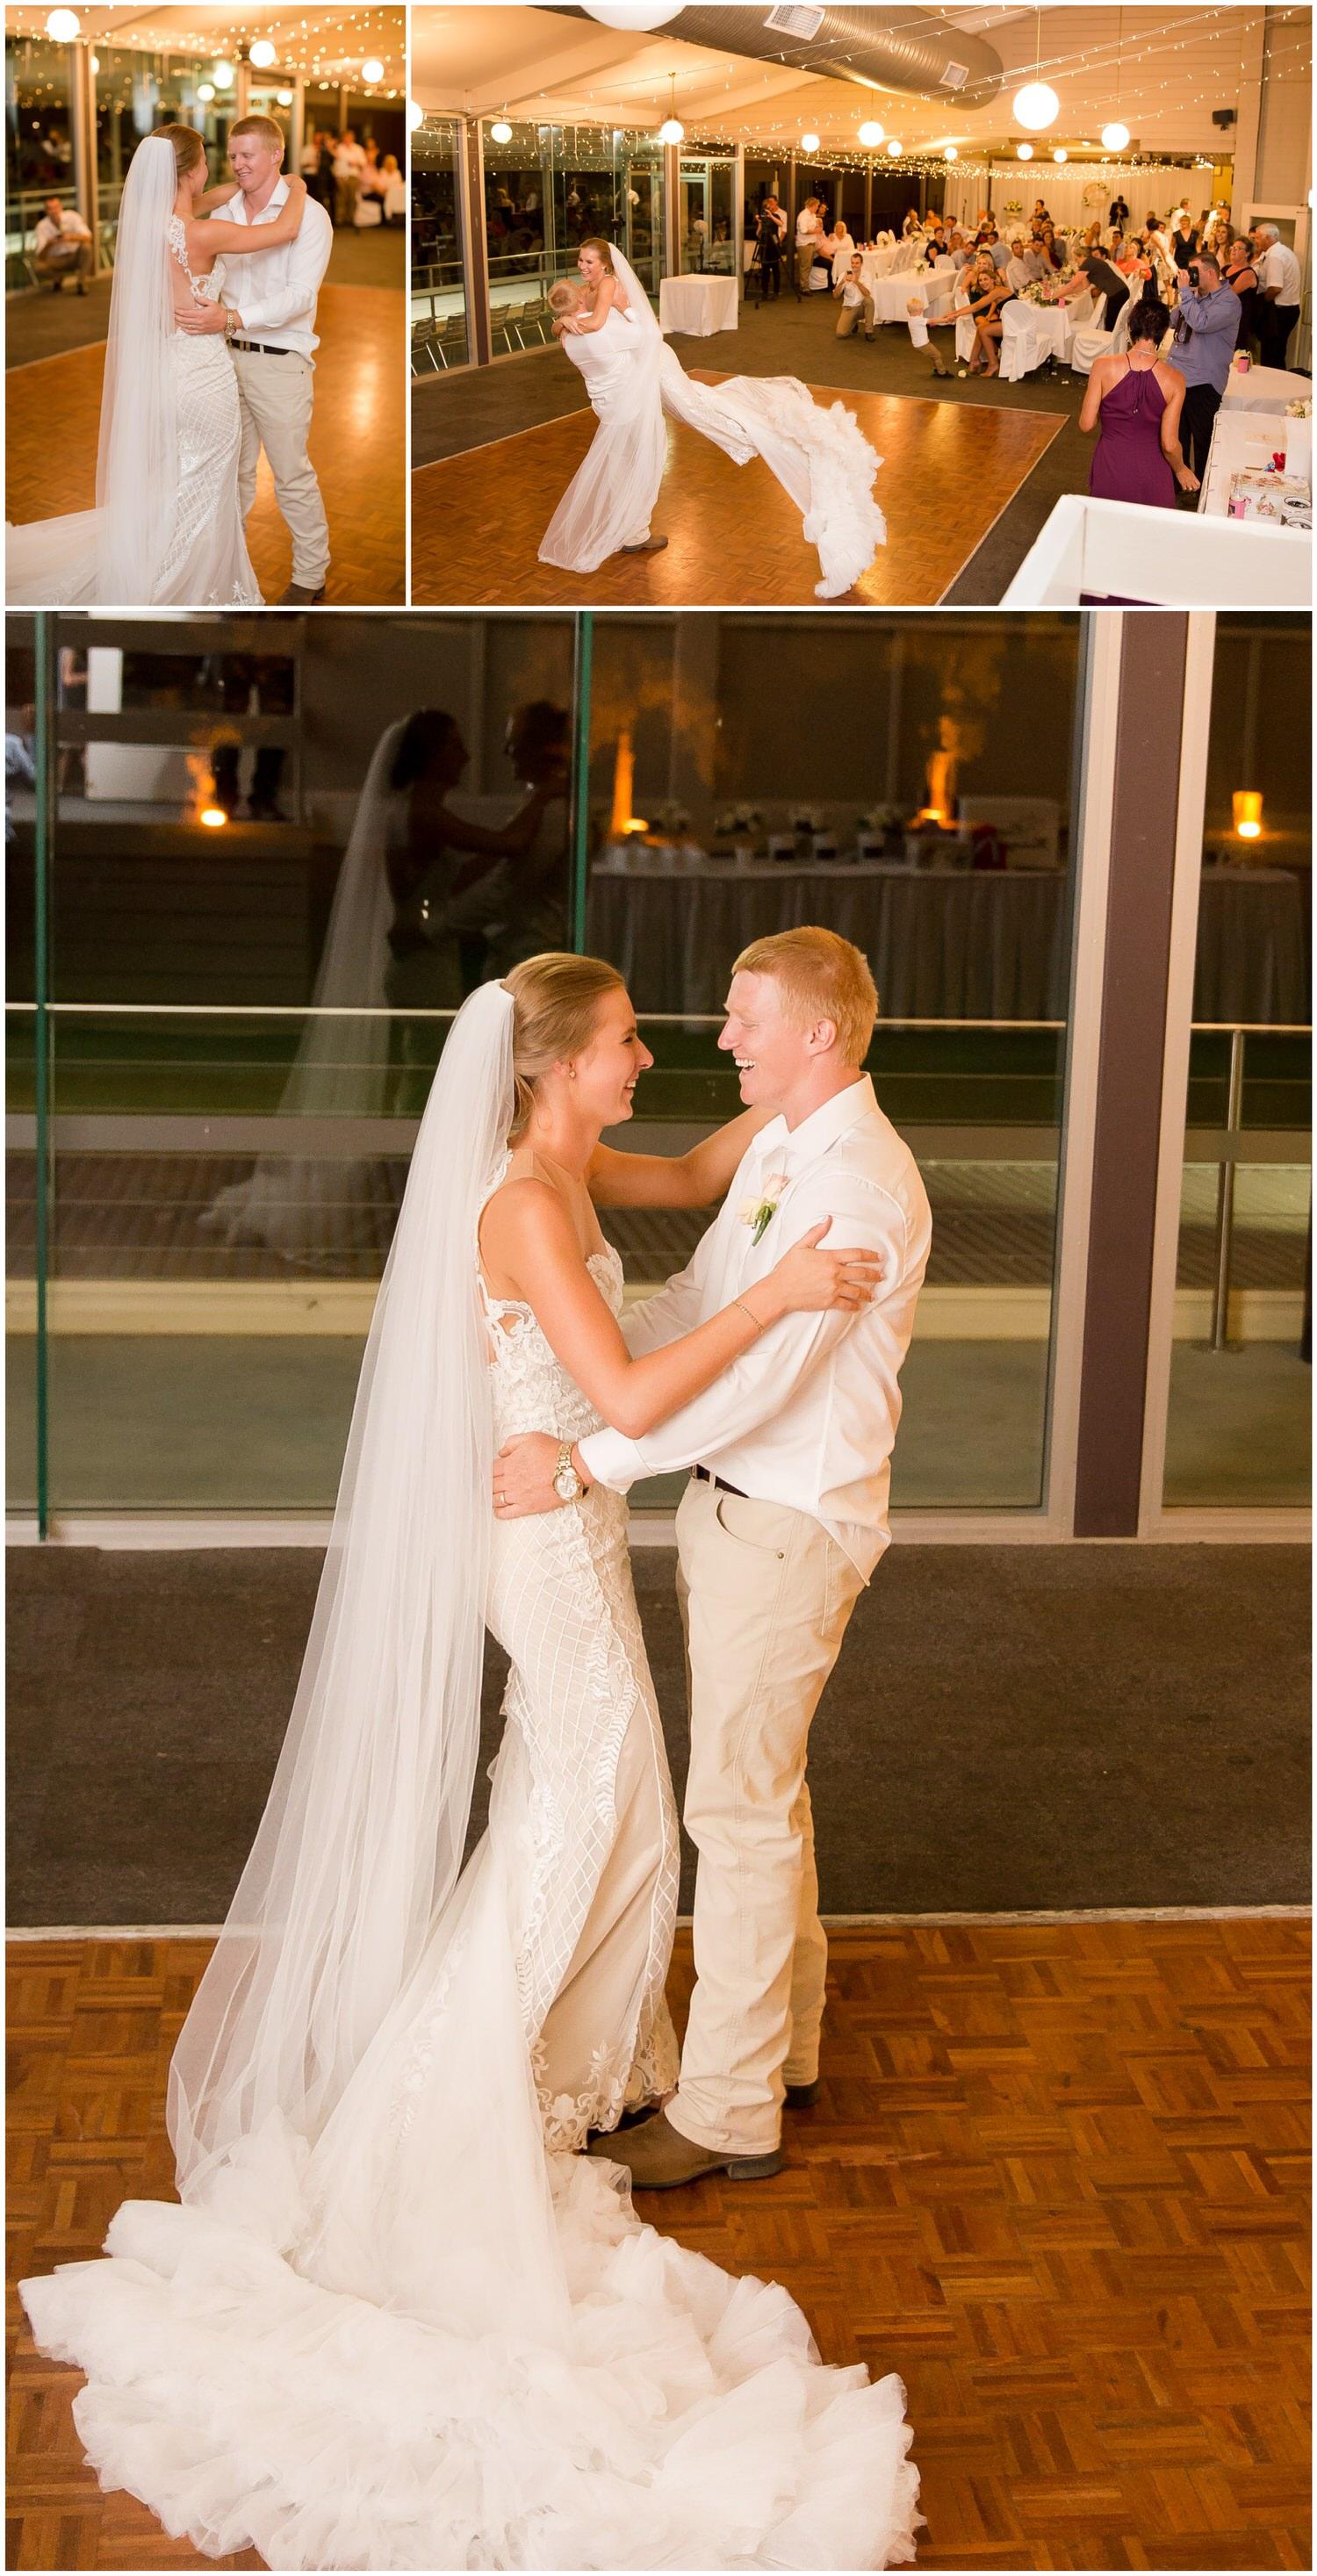 Dubbo Wedding Photography - Dubbo Golf Club Wedding 16